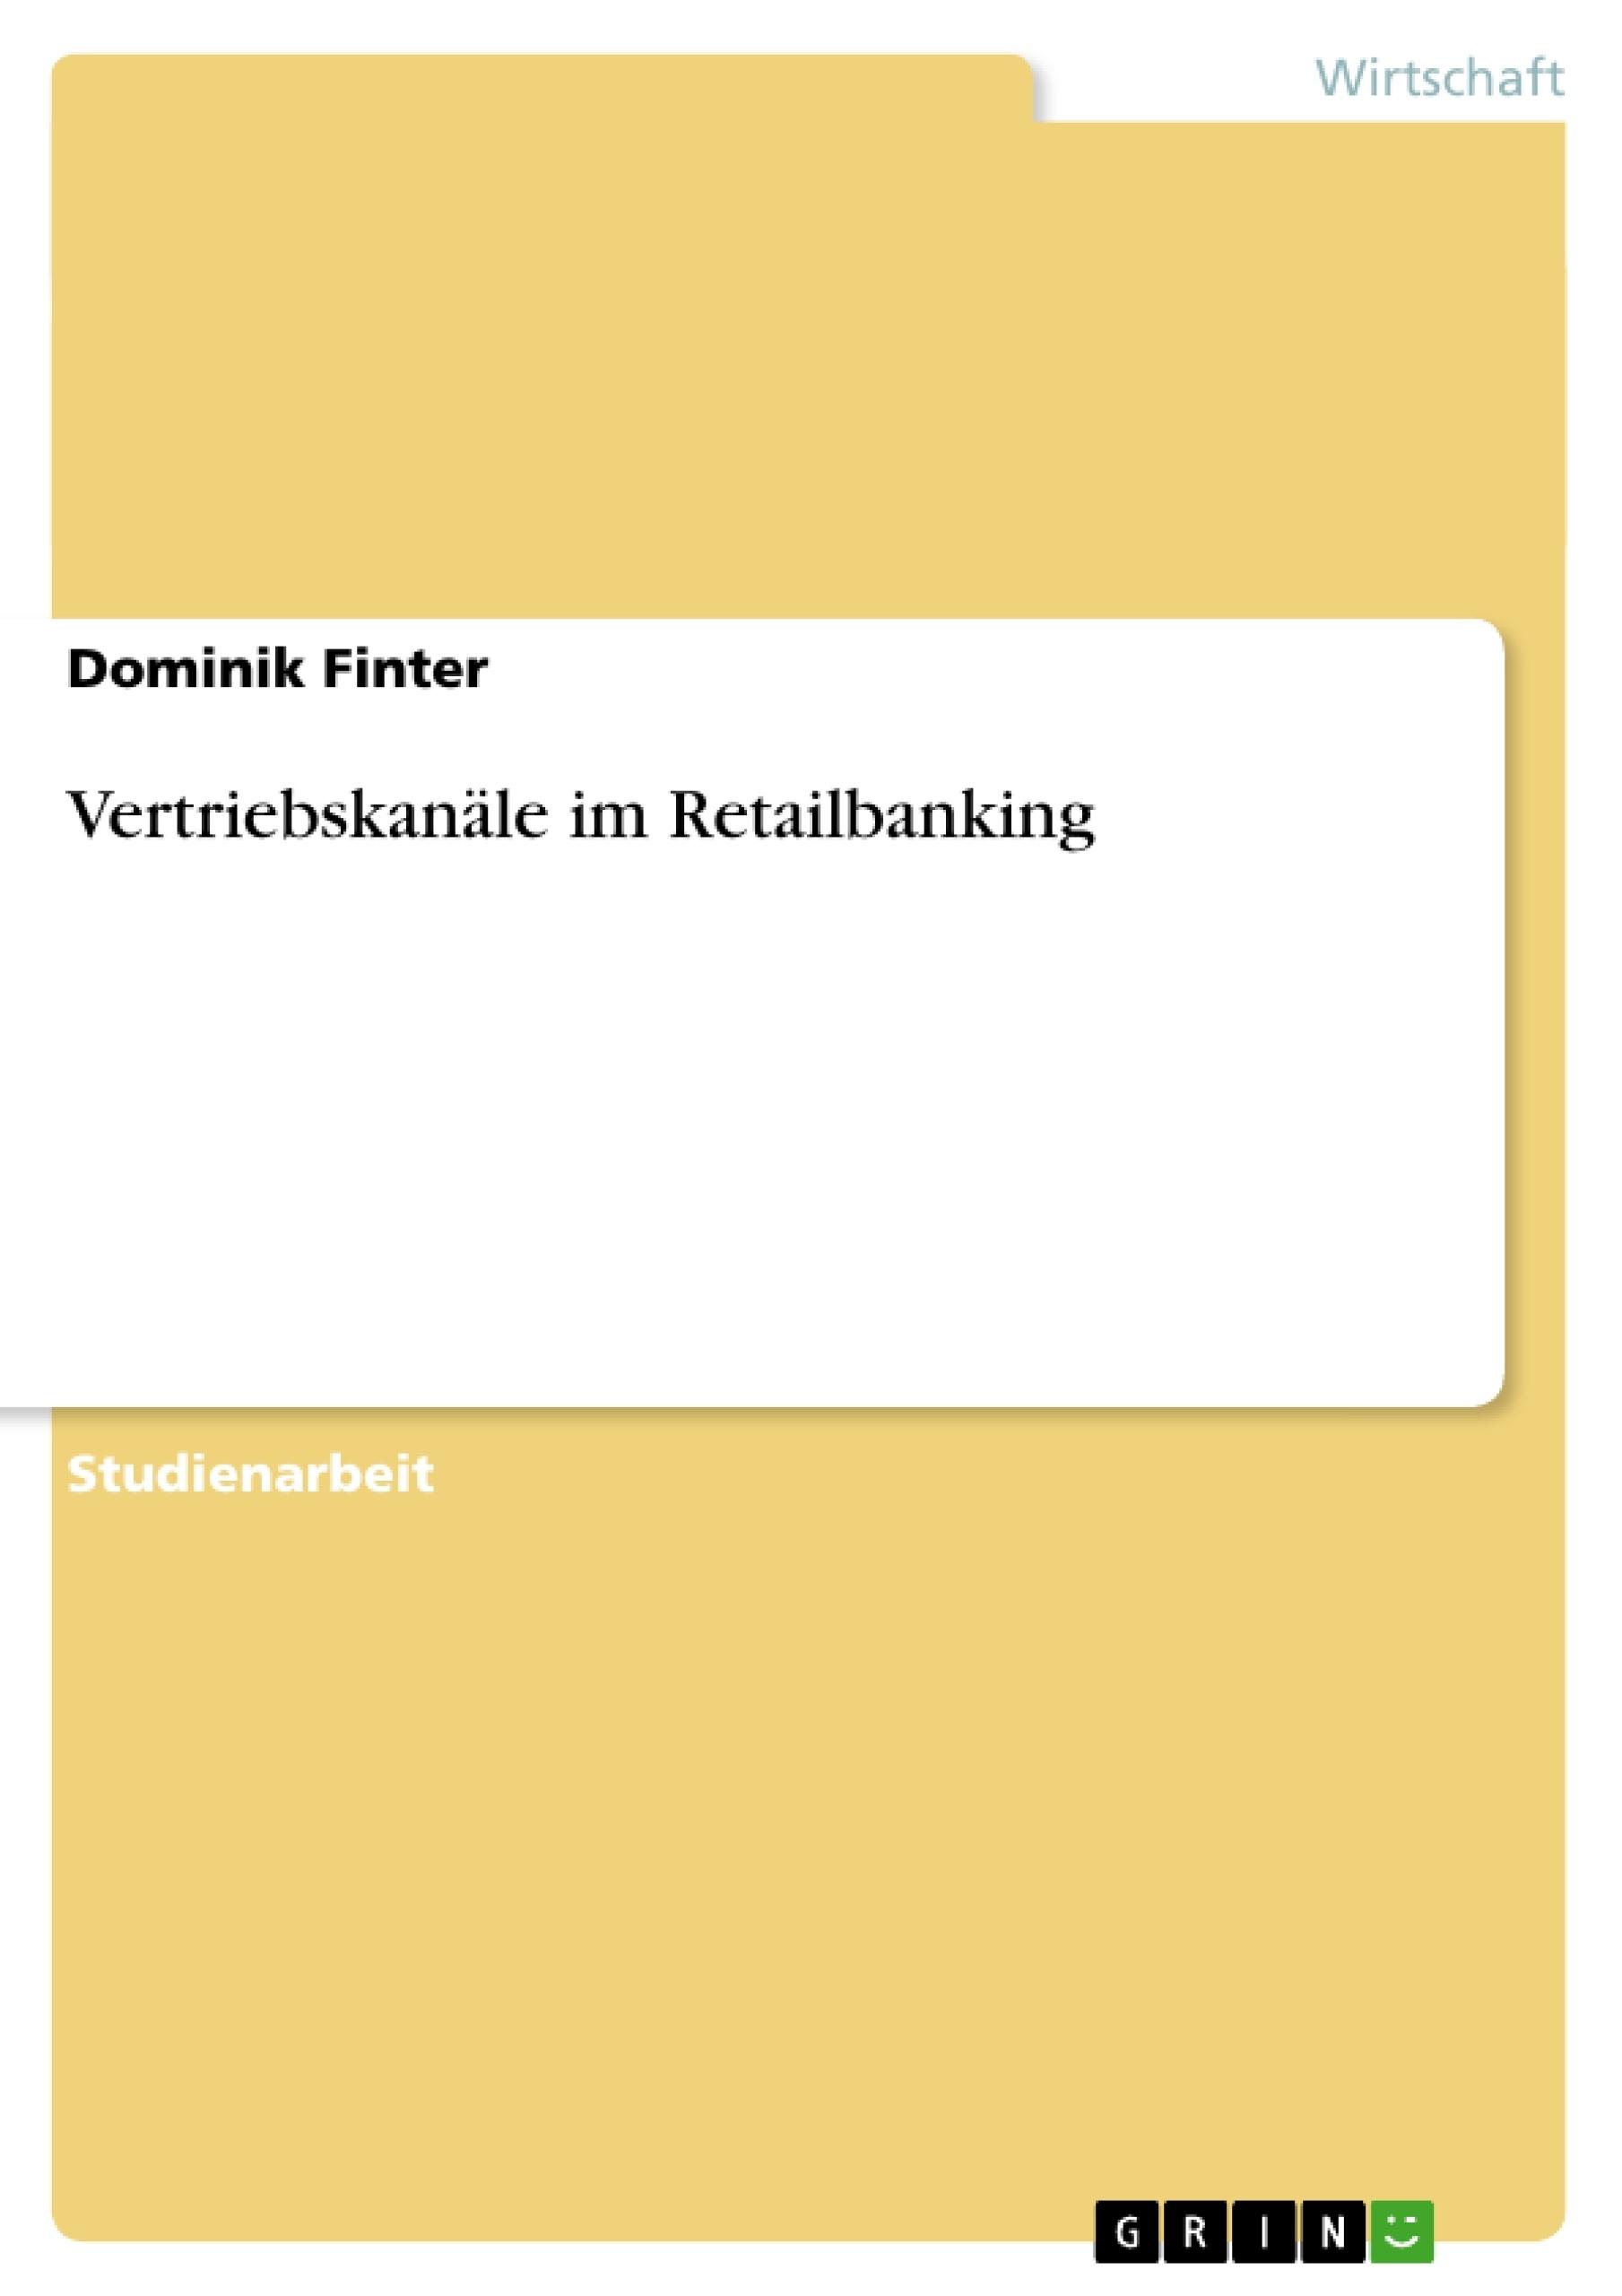 Titel: Vertriebskanäle im Retailbanking